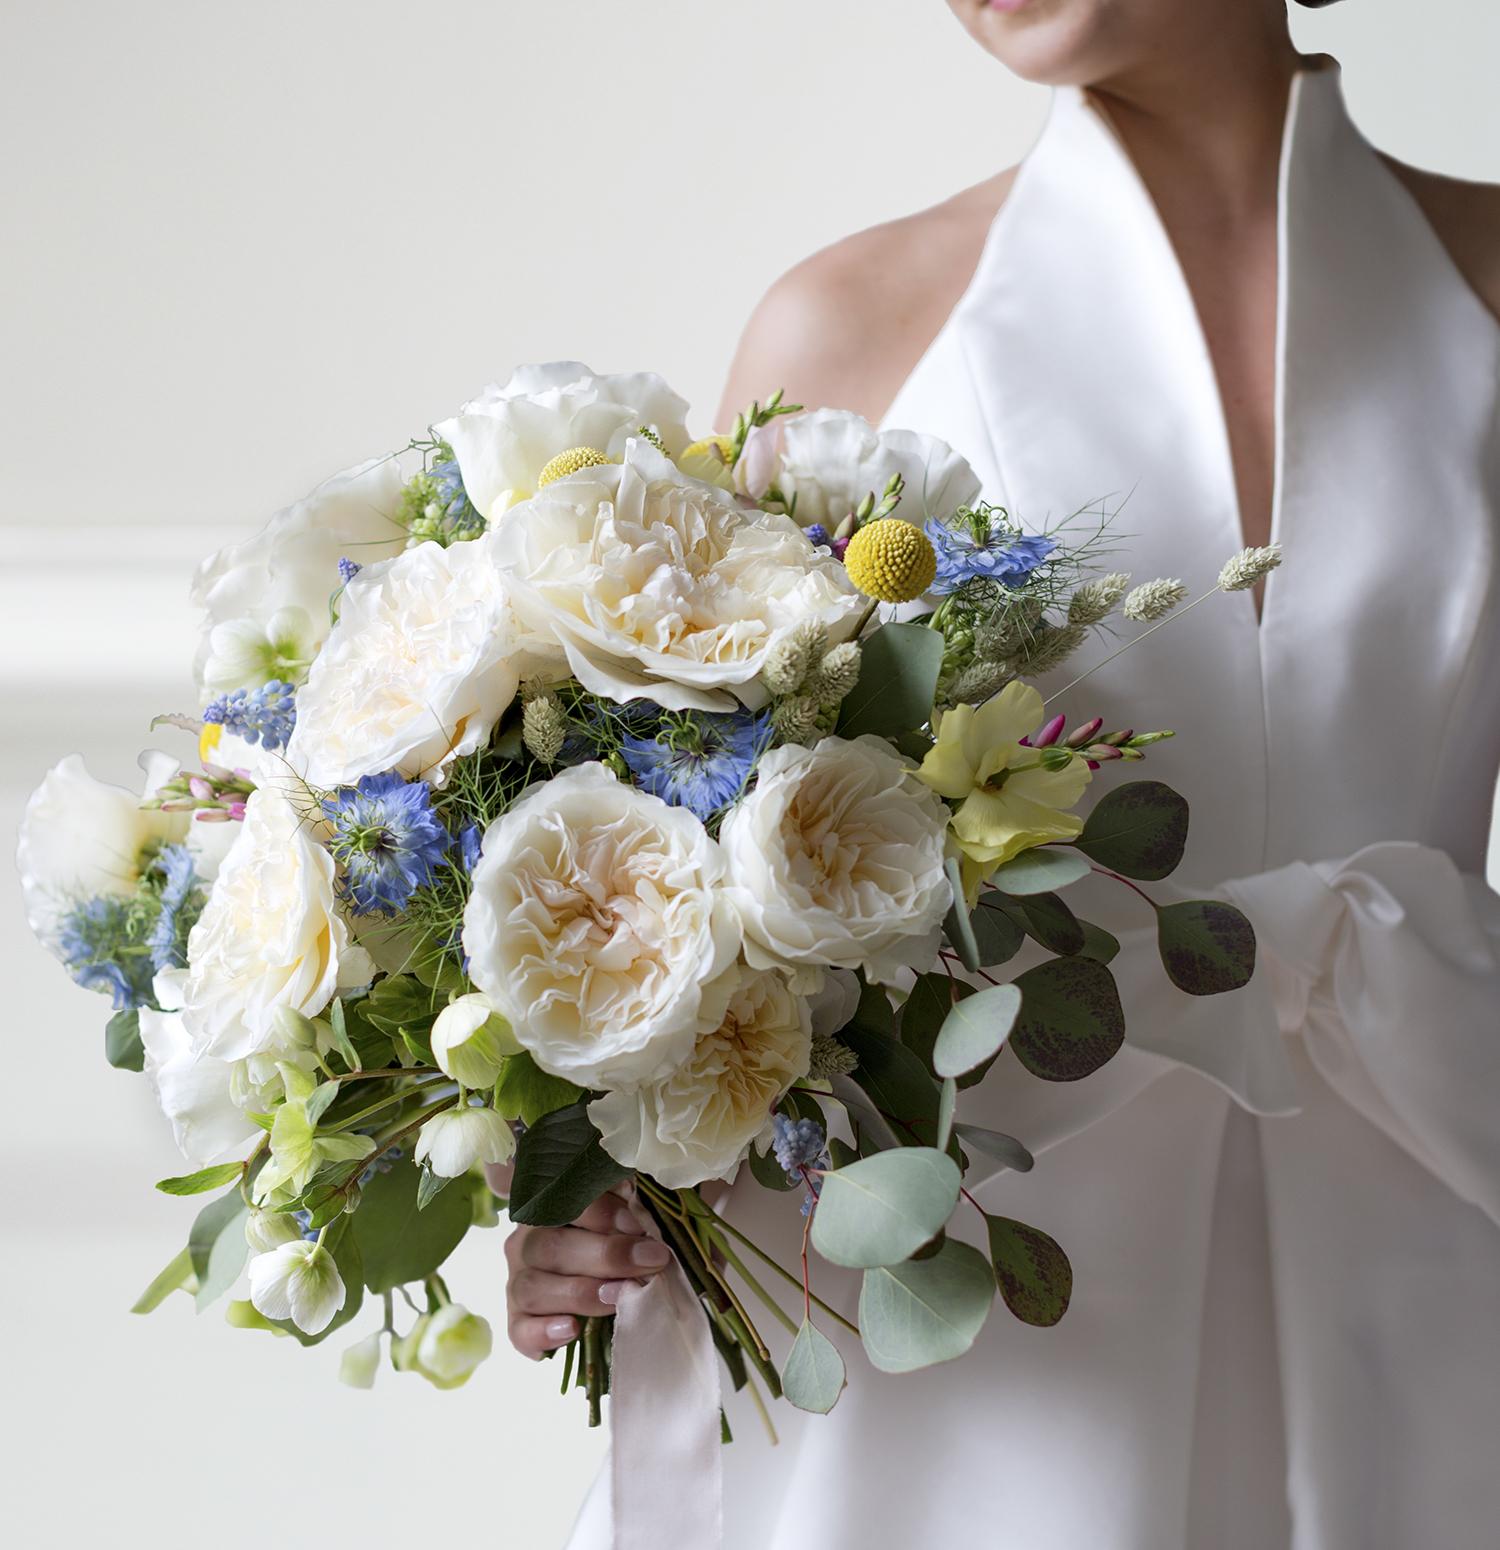 Eugenie rose David Austin Bride Bouquet